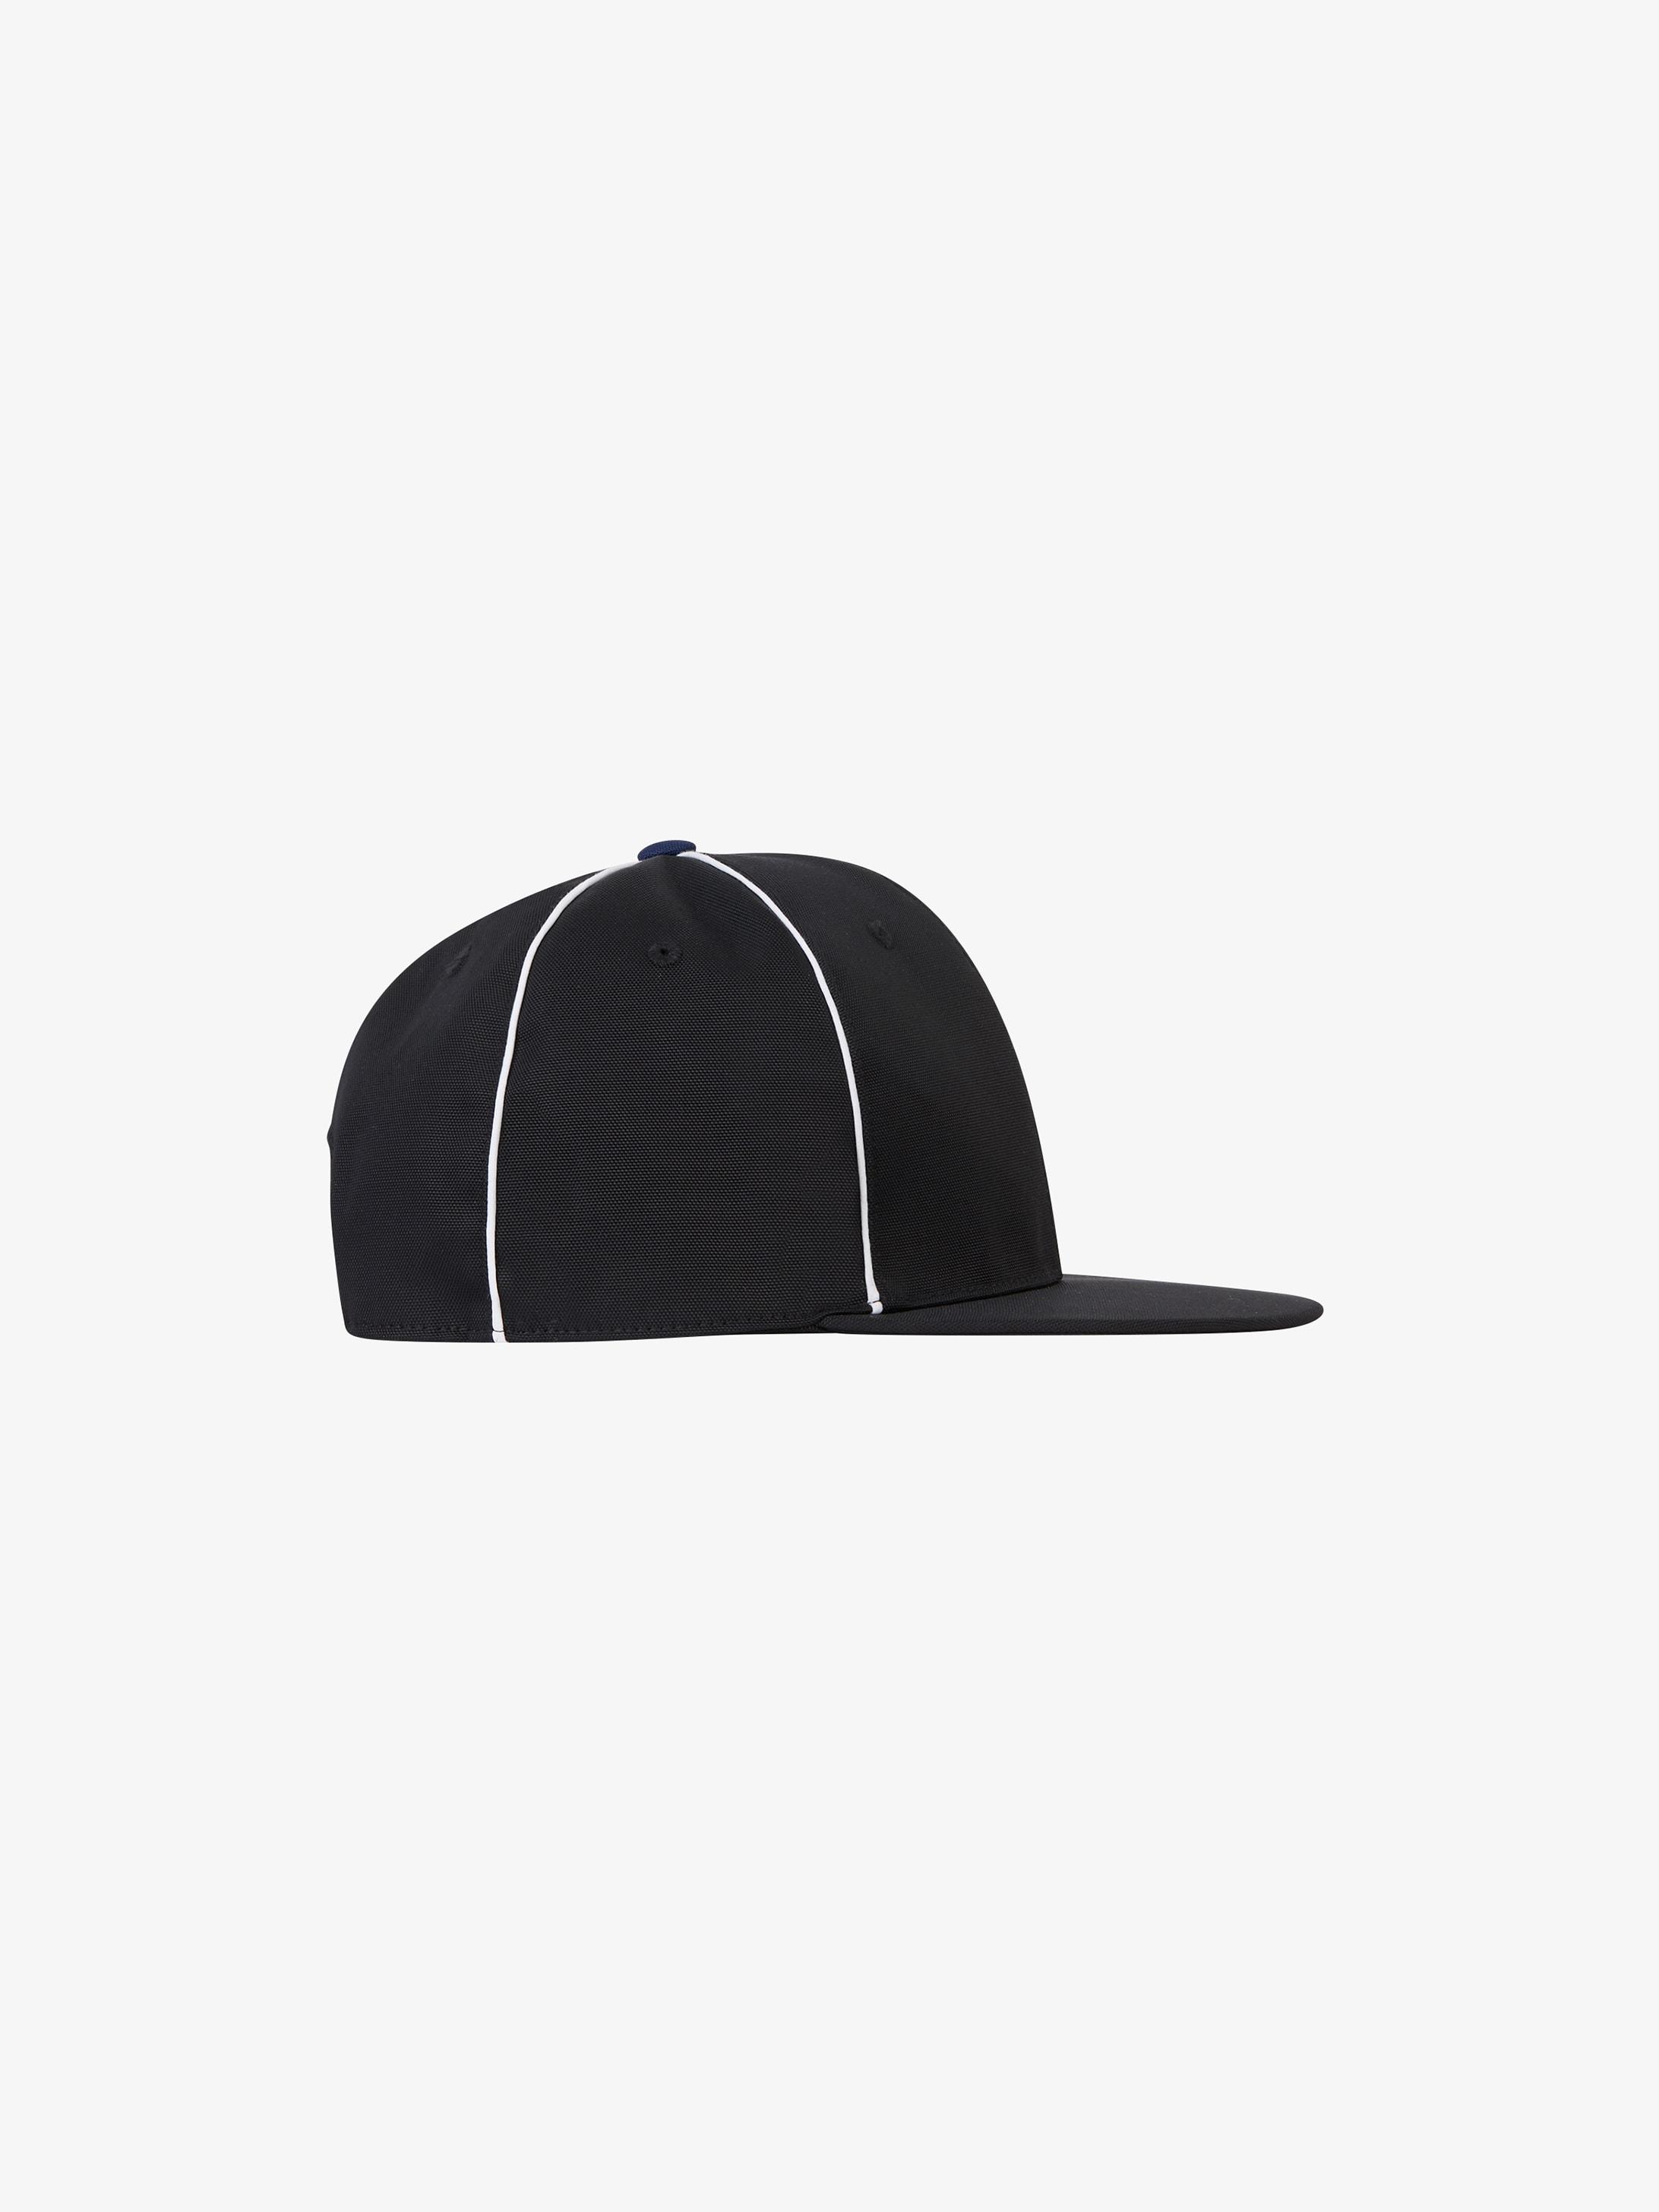 GIVENCHY bicolor cap